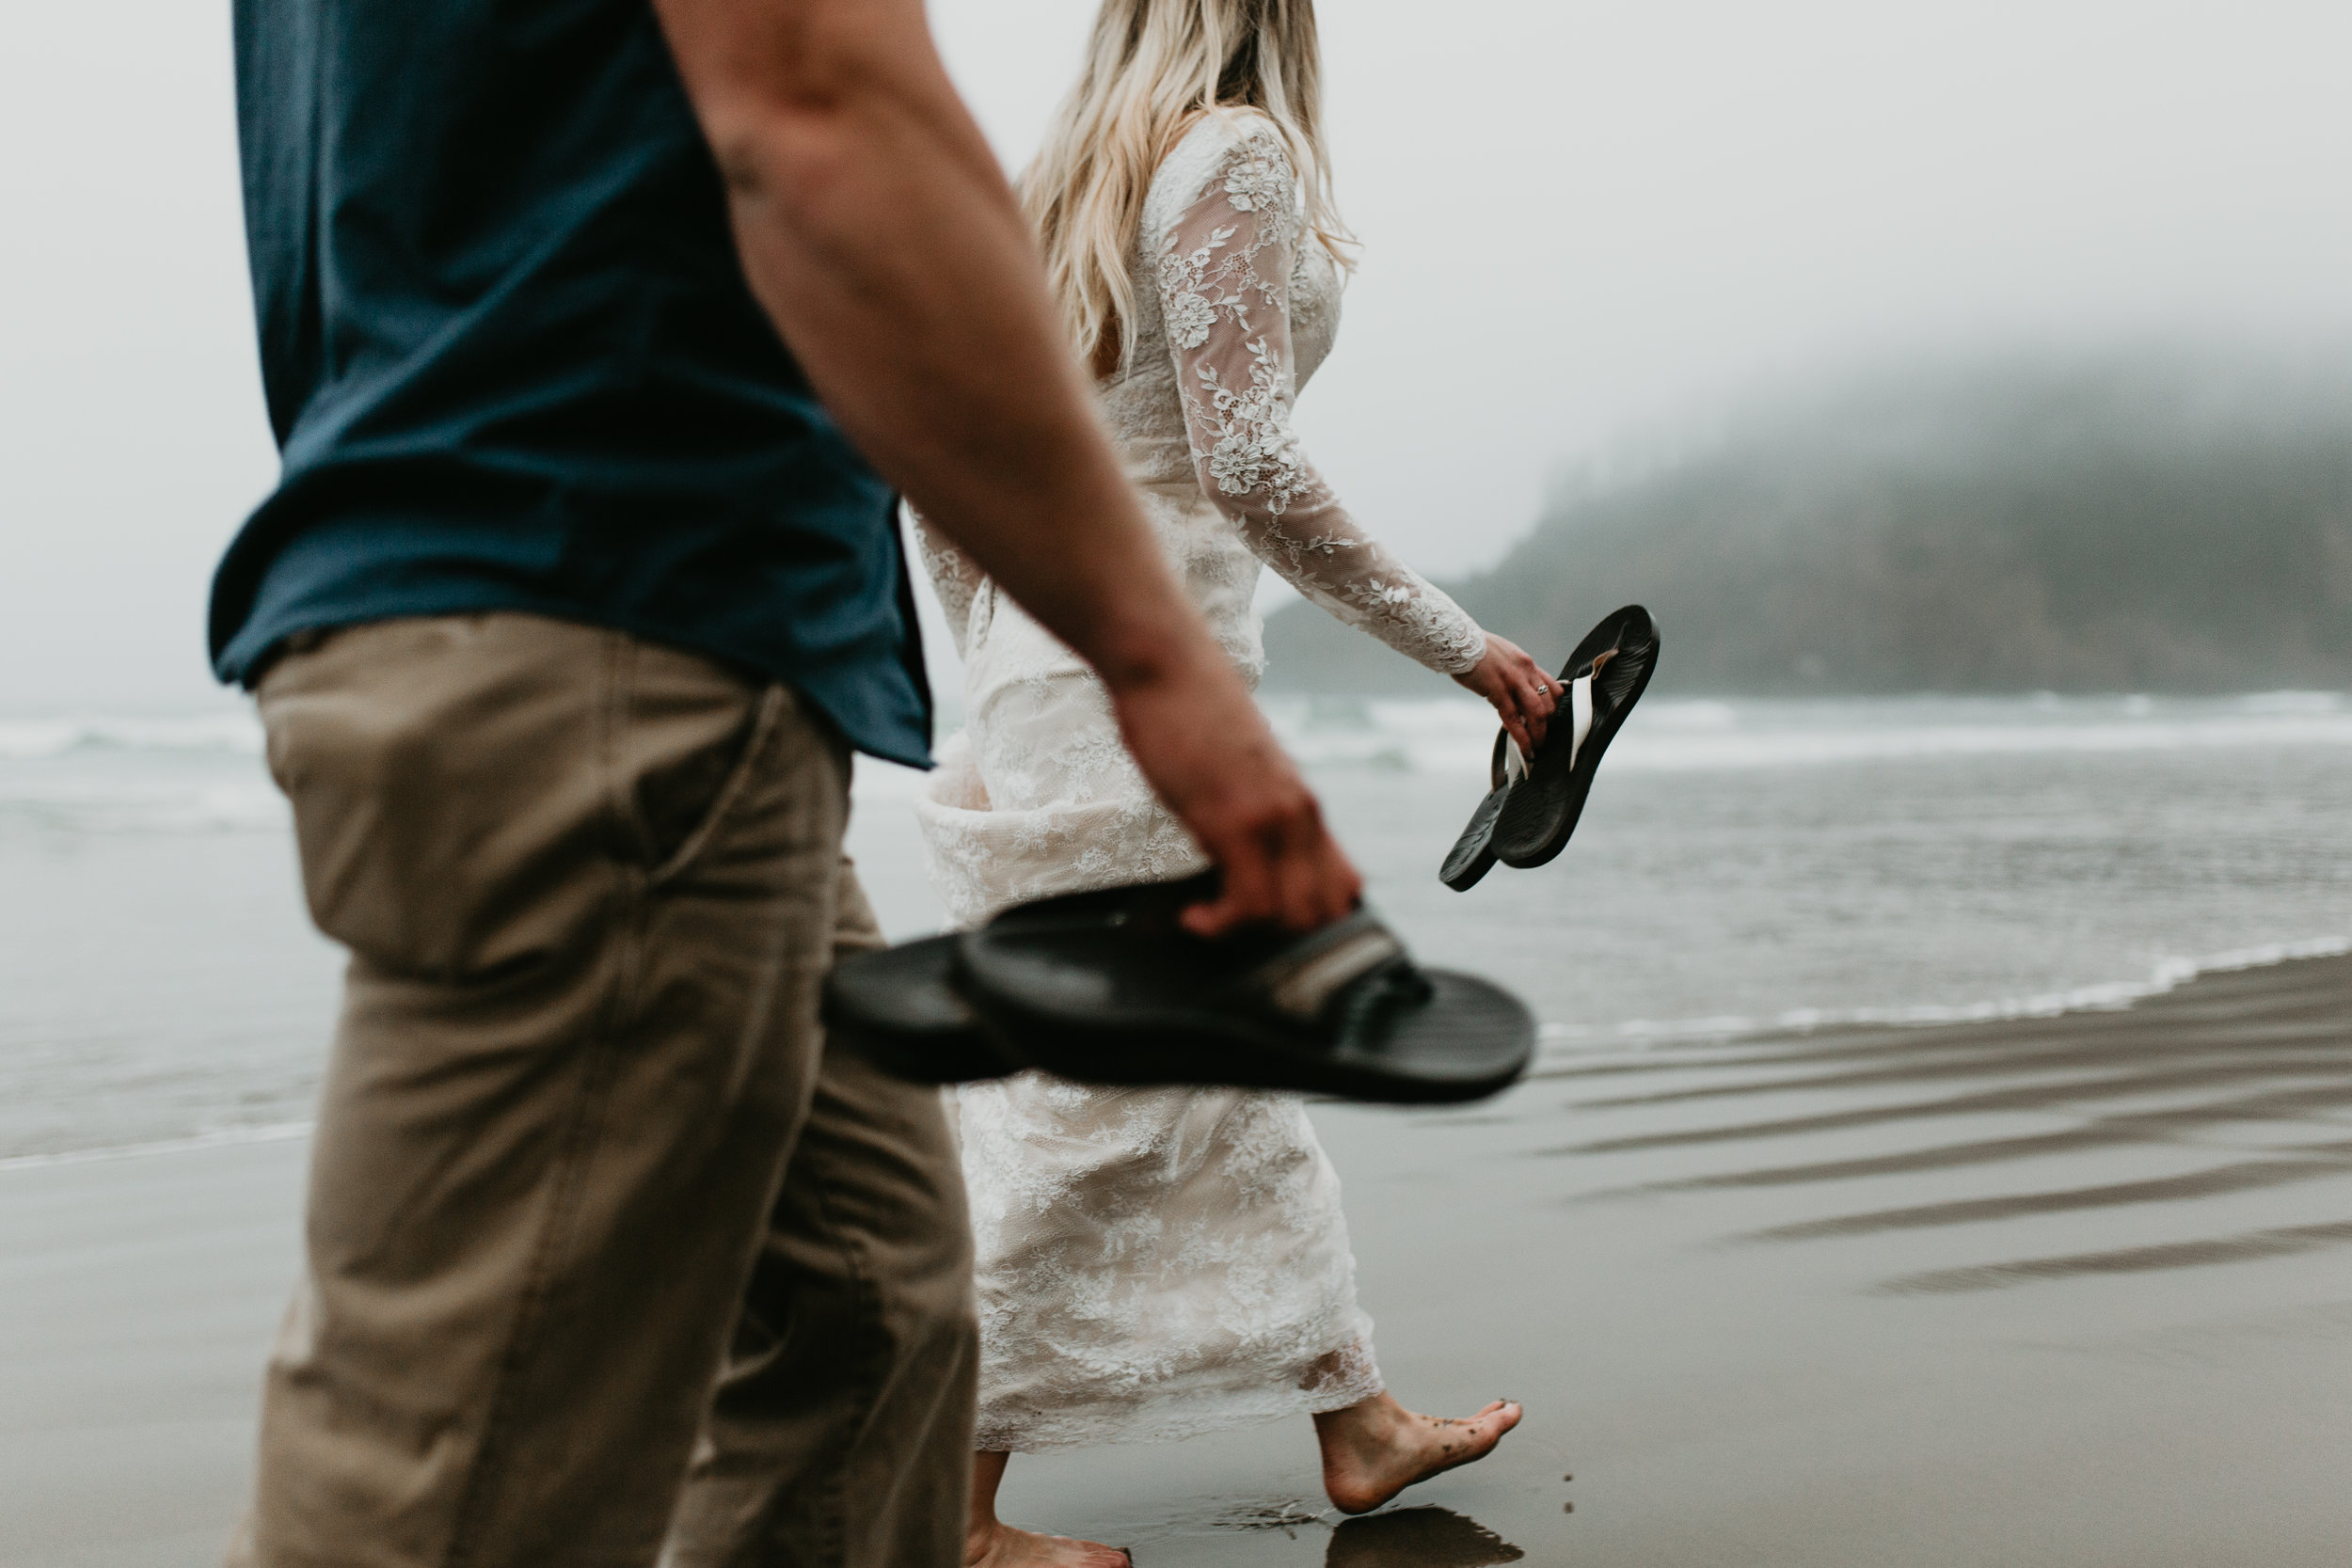 nicole-daacke-photography-ecola-state-park-oregon-elopement-bridal-photos-photographer-for-cannon-beach-elopement-oregon-coast-elopement-photographer-foggy-summer-elopement-cannon-beach-best-adventure-elopement-photographer-7144.jpg